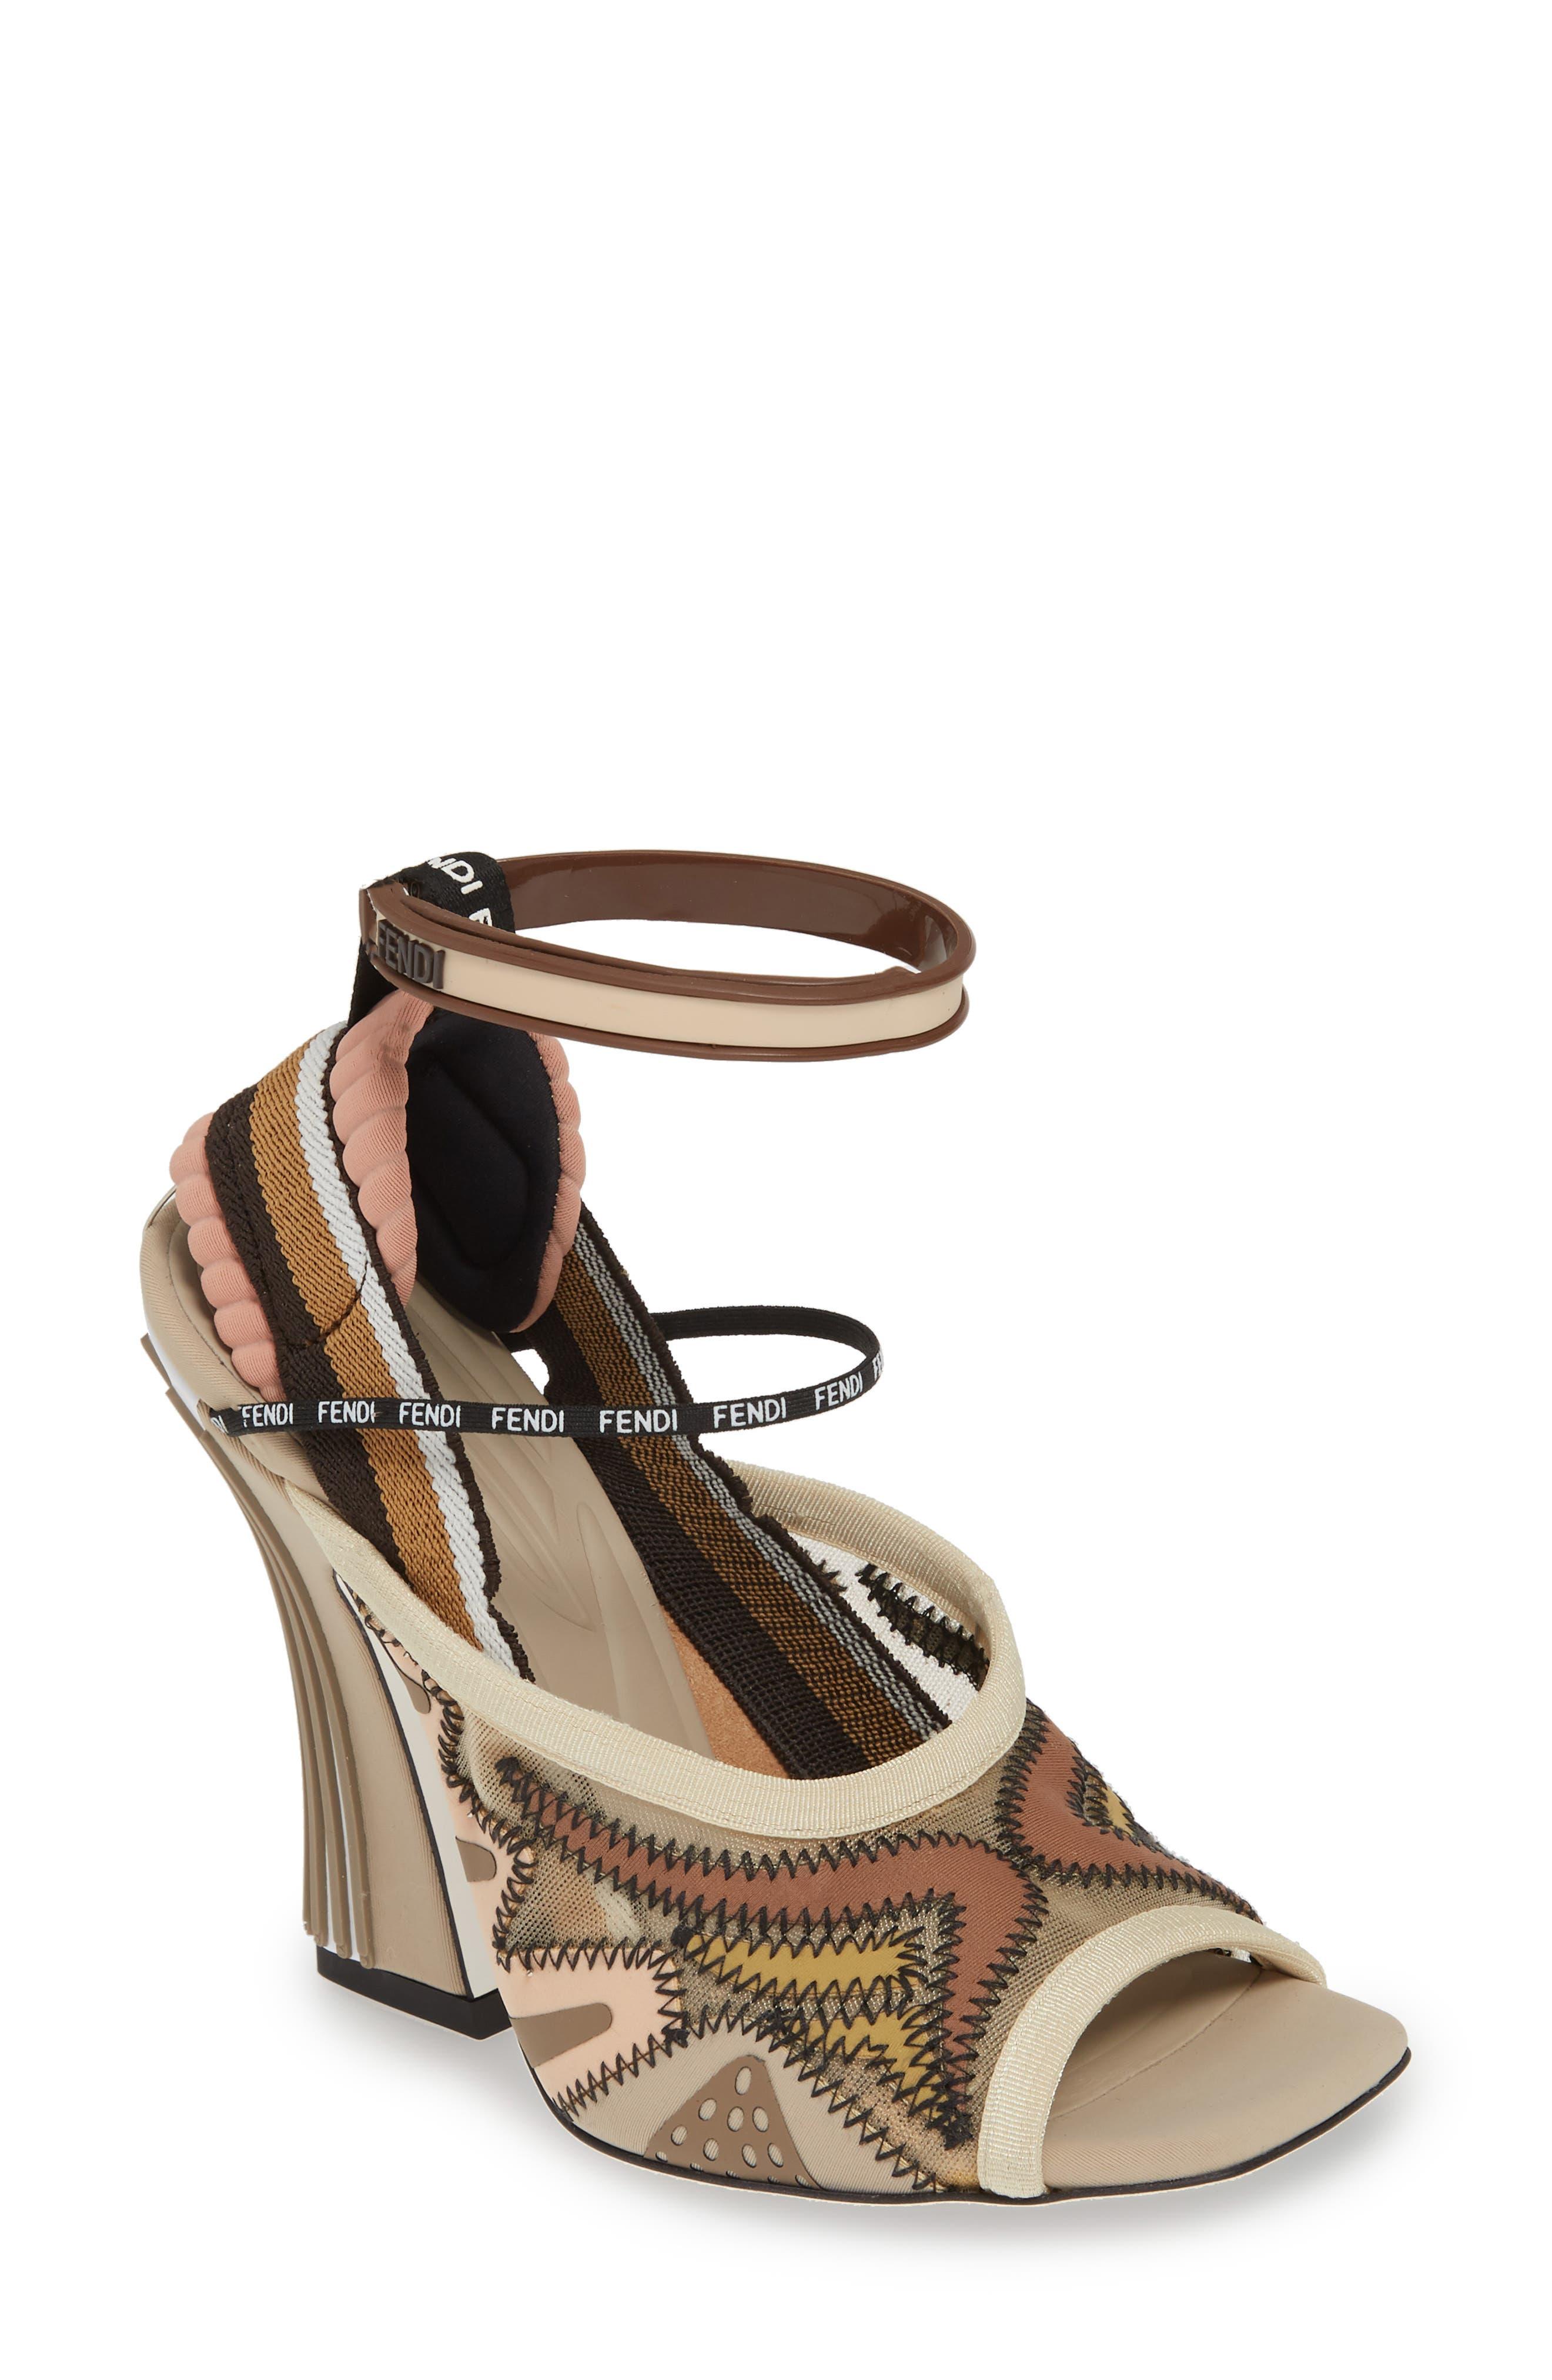 004119bb96c Women s Fendi Sandals